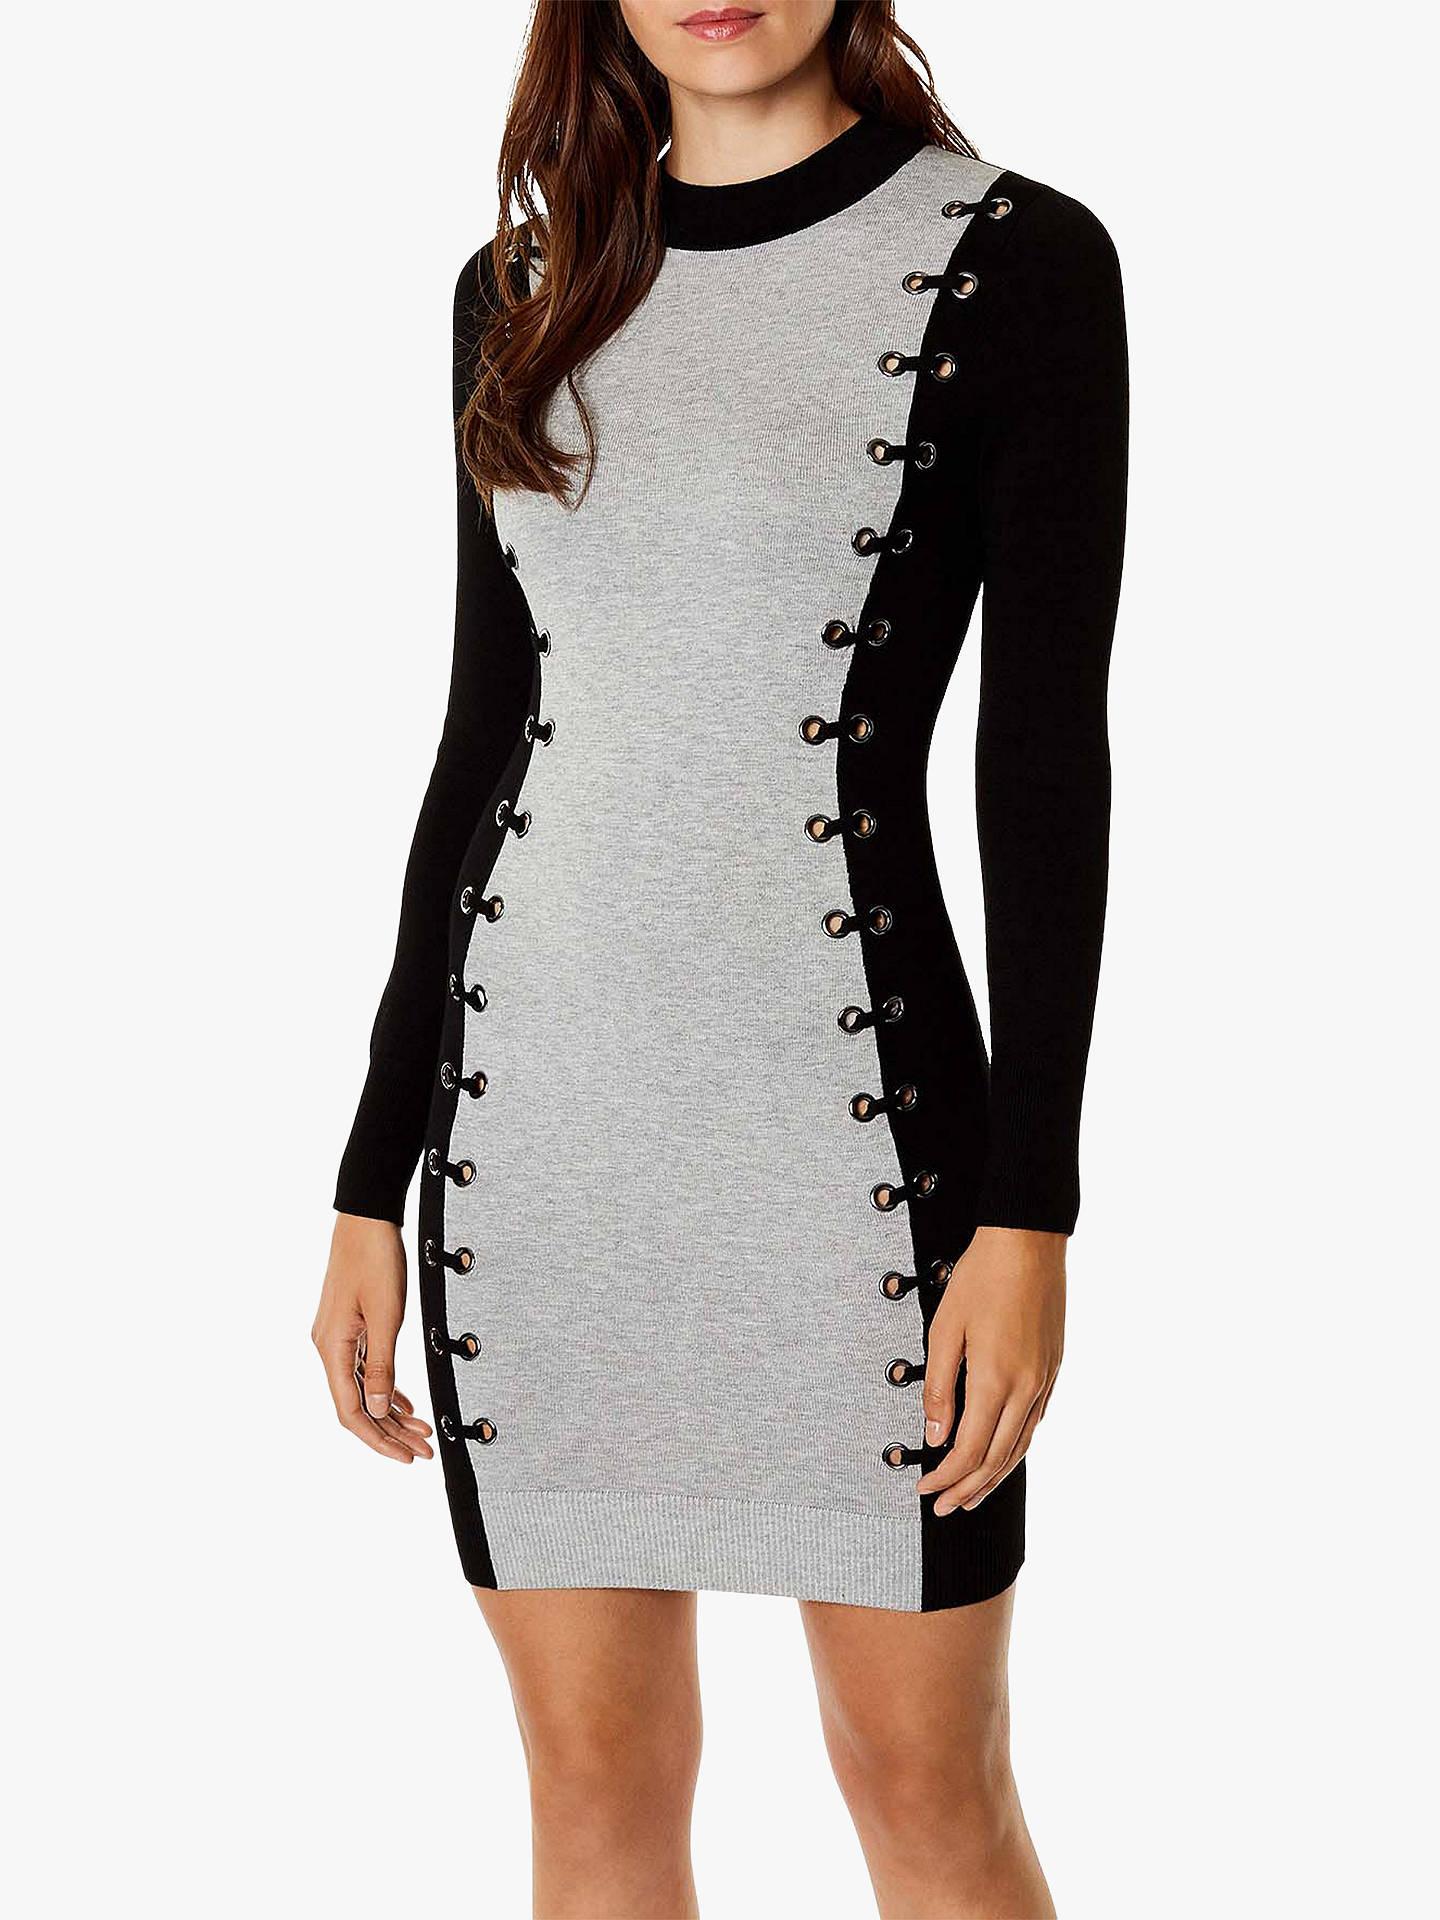 72c84d55701d Buy Karen Millen Eyelet Pencil Dress, Black, XS Online at johnlewis.com ...